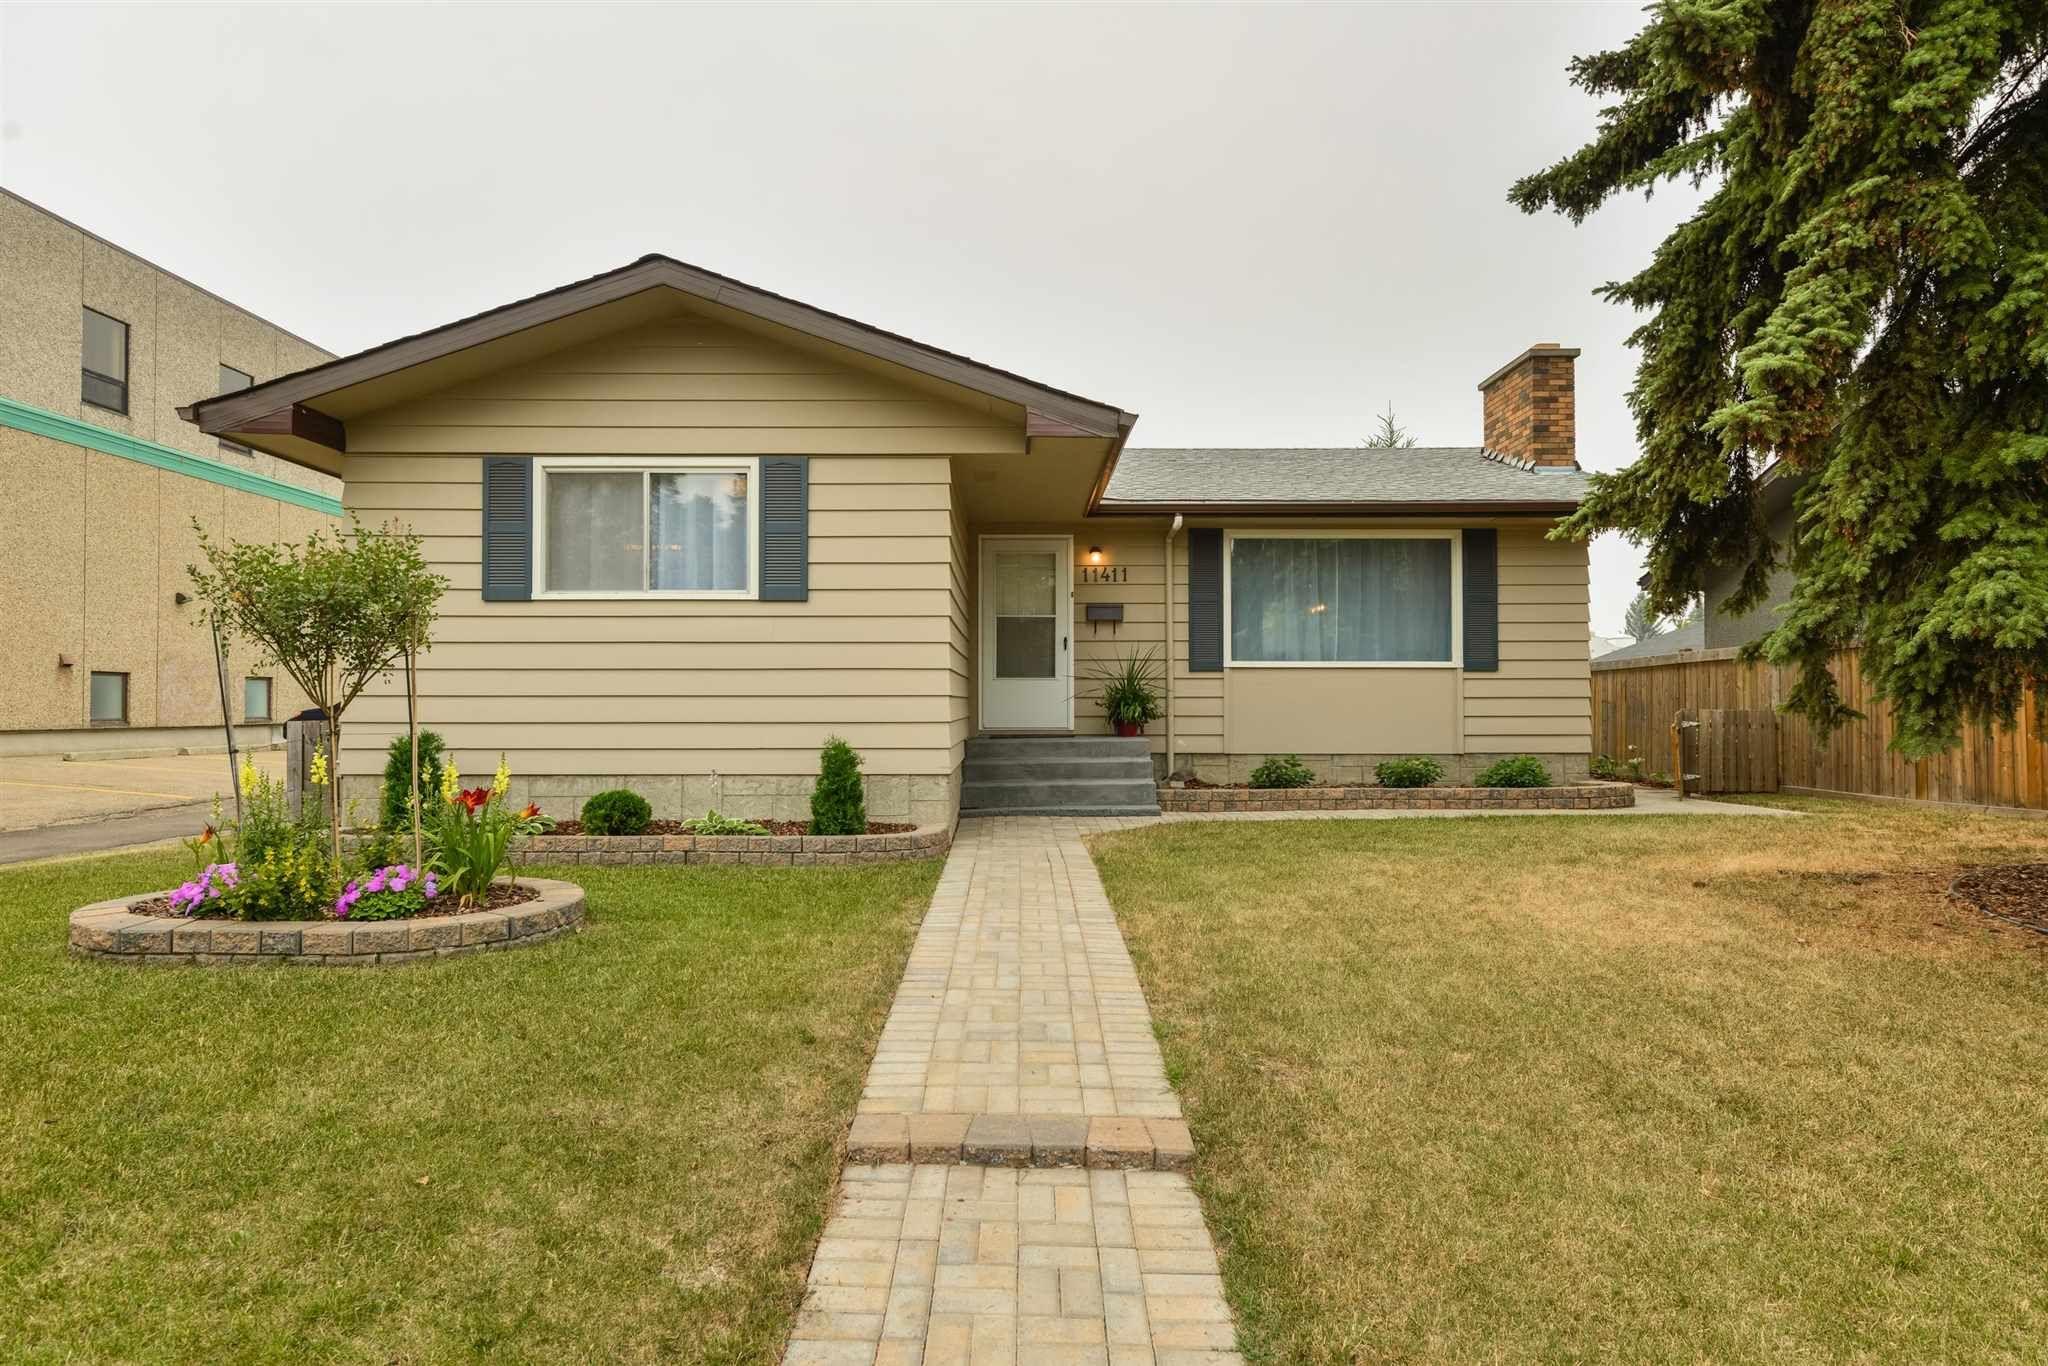 Main Photo: 11411 37A Avenue in Edmonton: Zone 16 House for sale : MLS®# E4255502